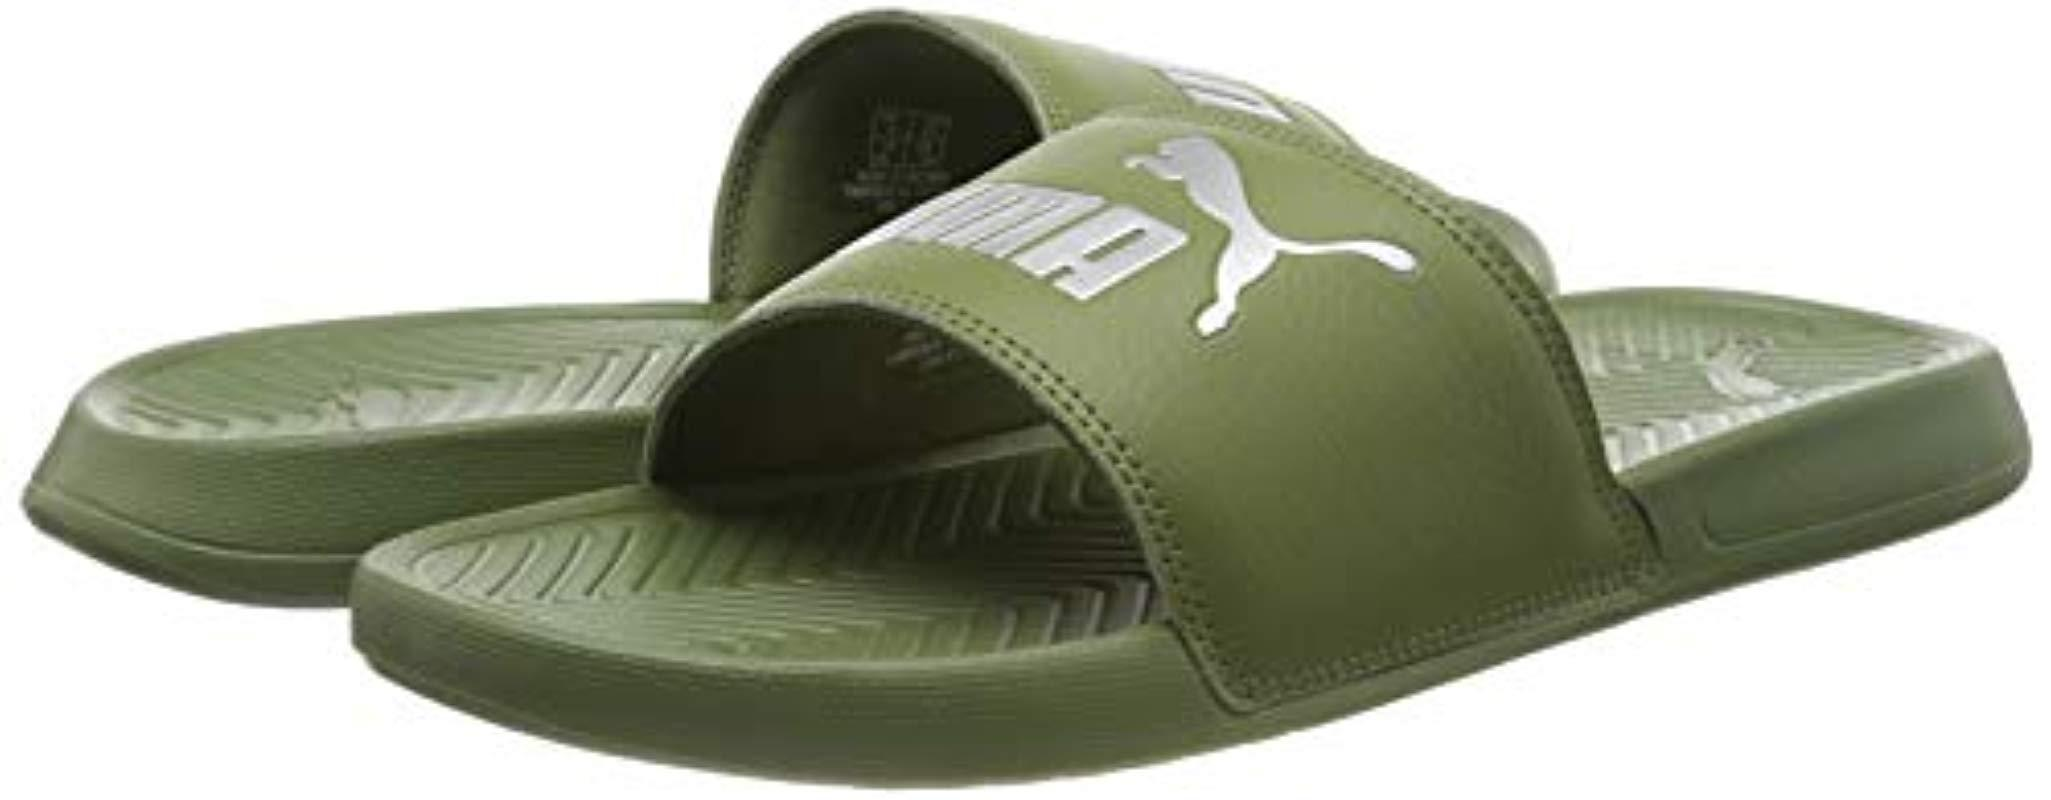 chaussures plage puma